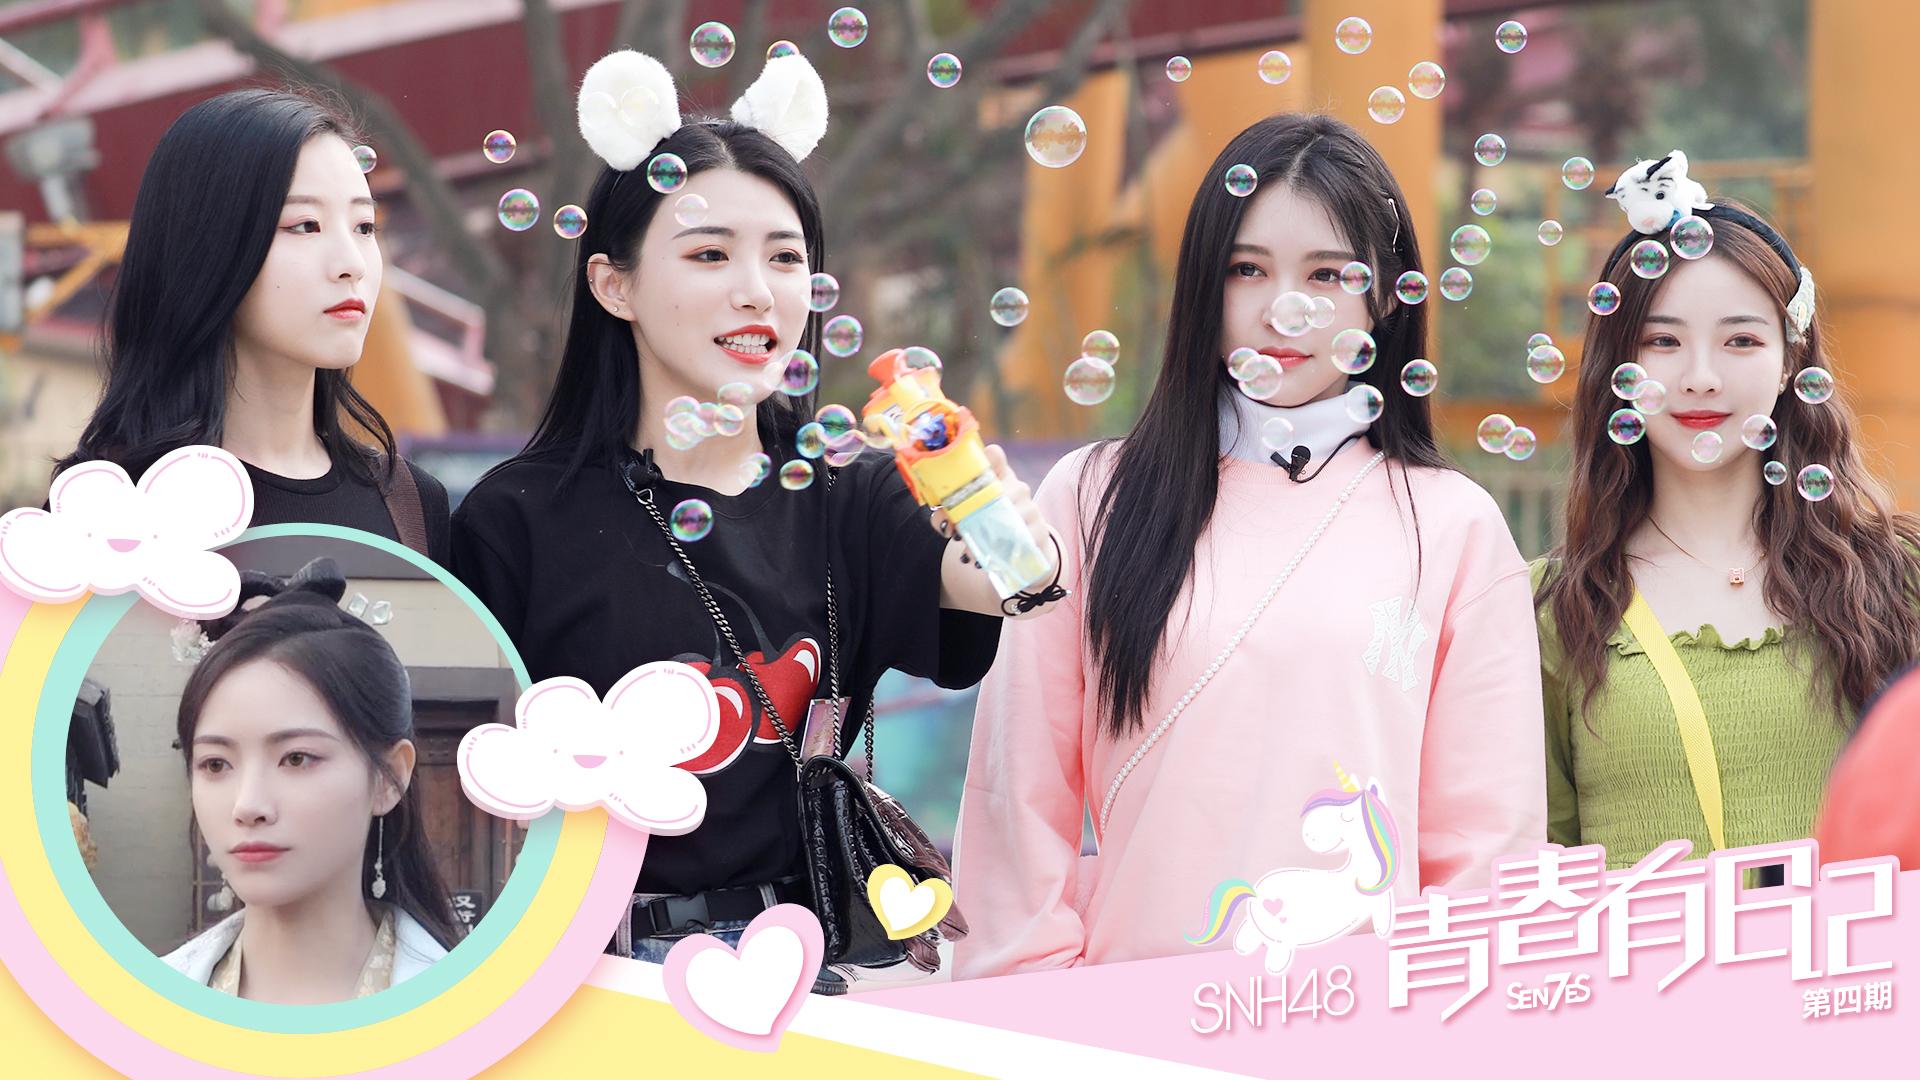 【SNH48-7SENSES】《青春有你2》限定vlog《青春有日记》第四集